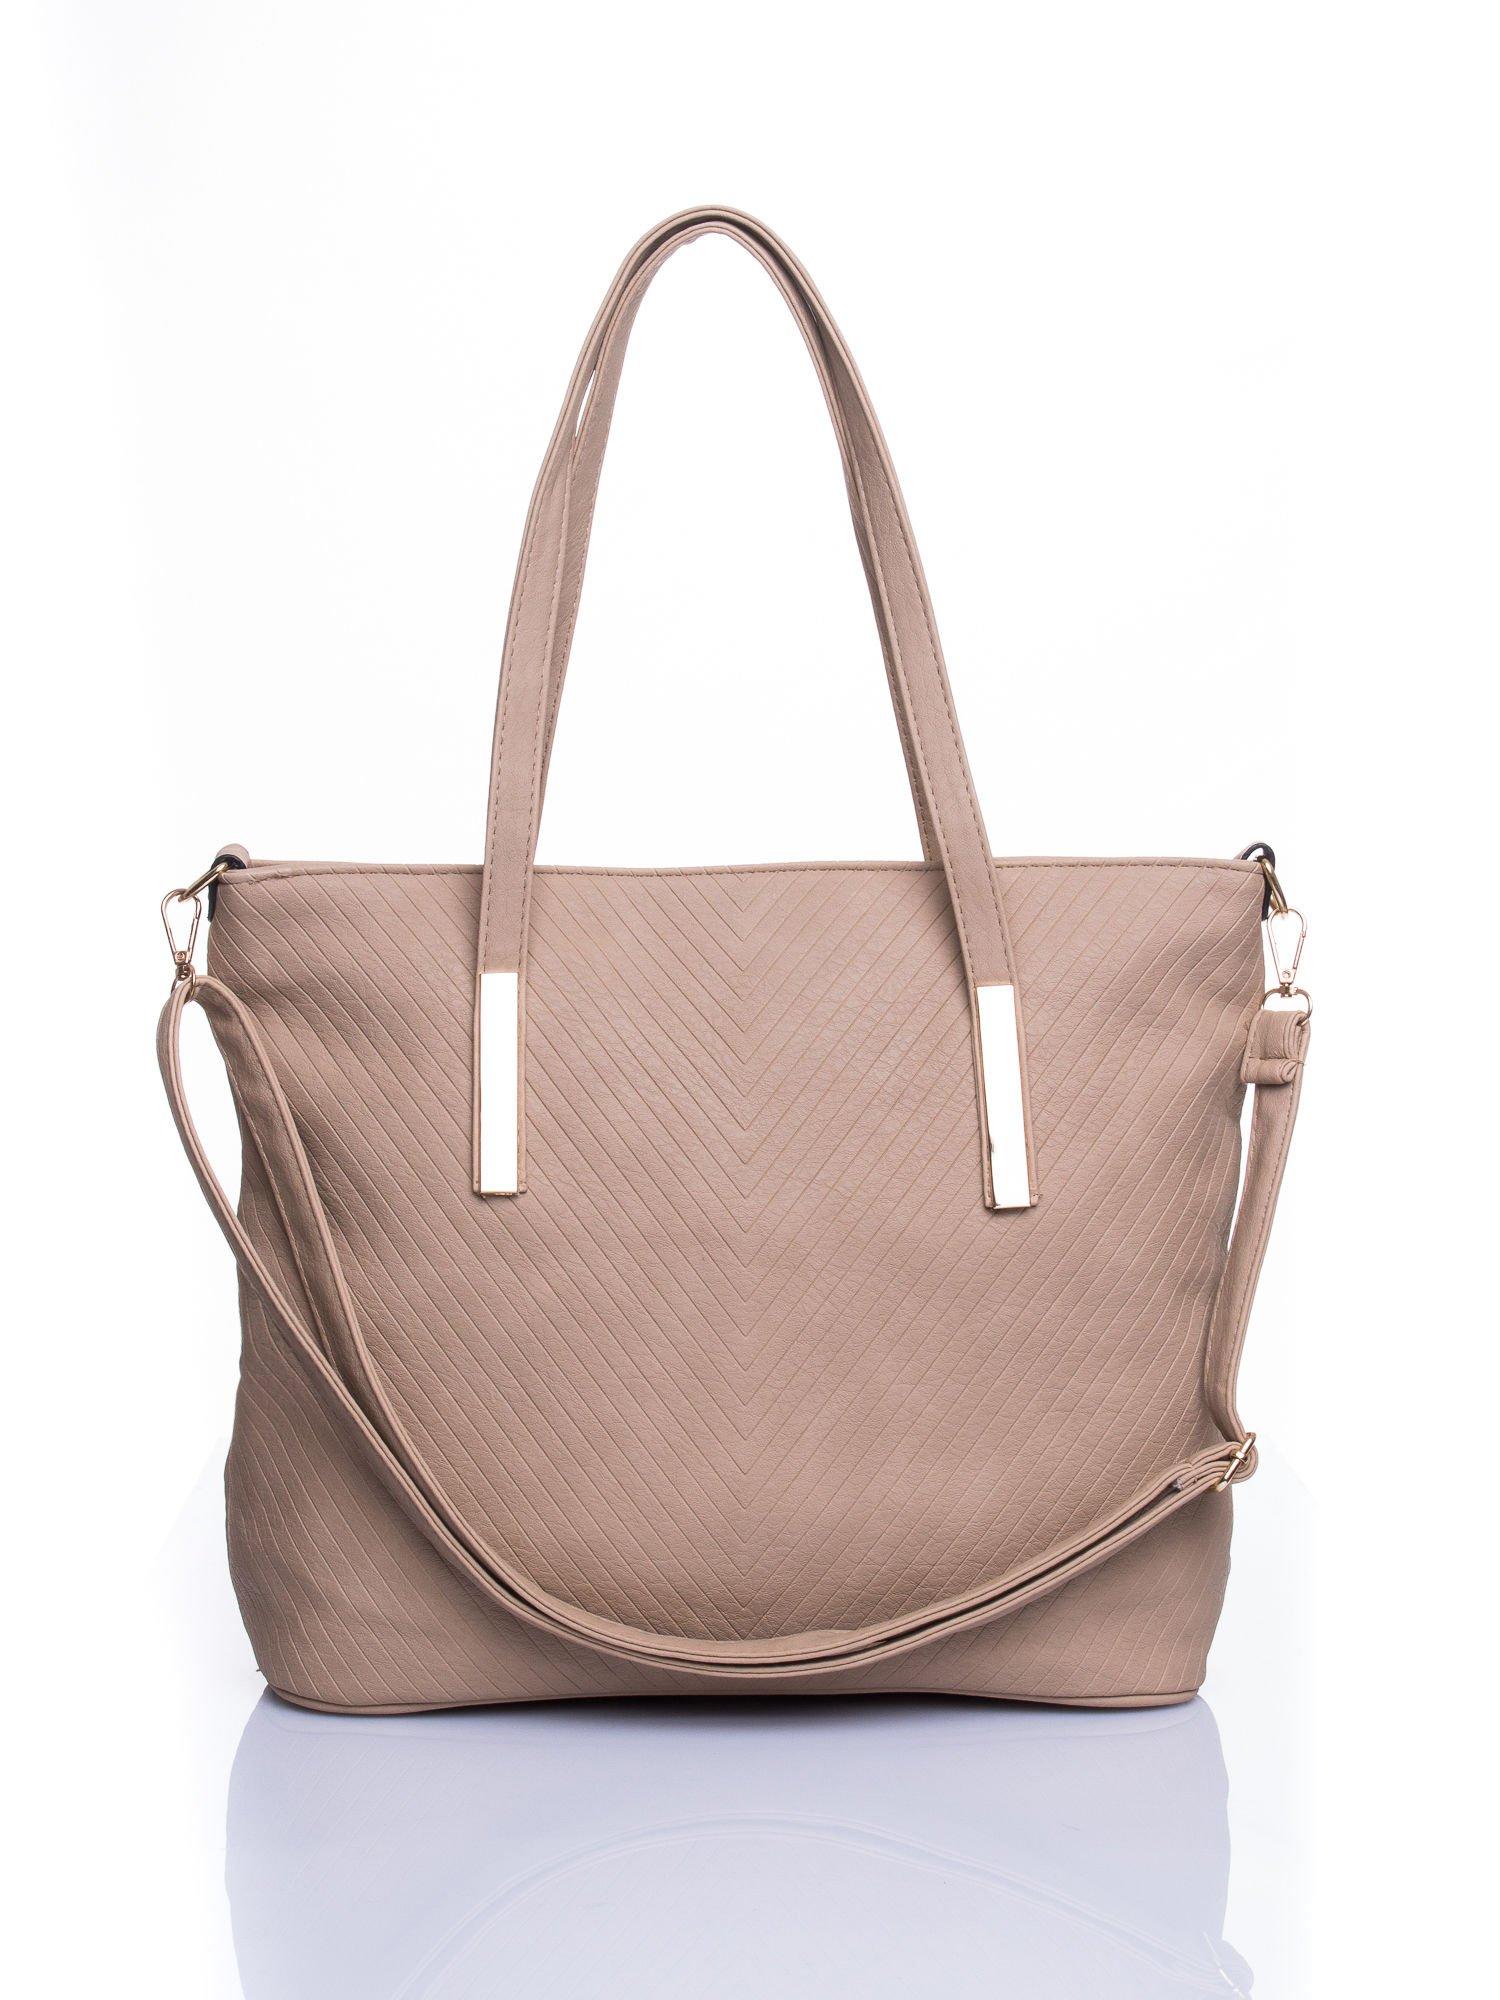 Beżowa fakturowana torba shopper bag                                  zdj.                                  1